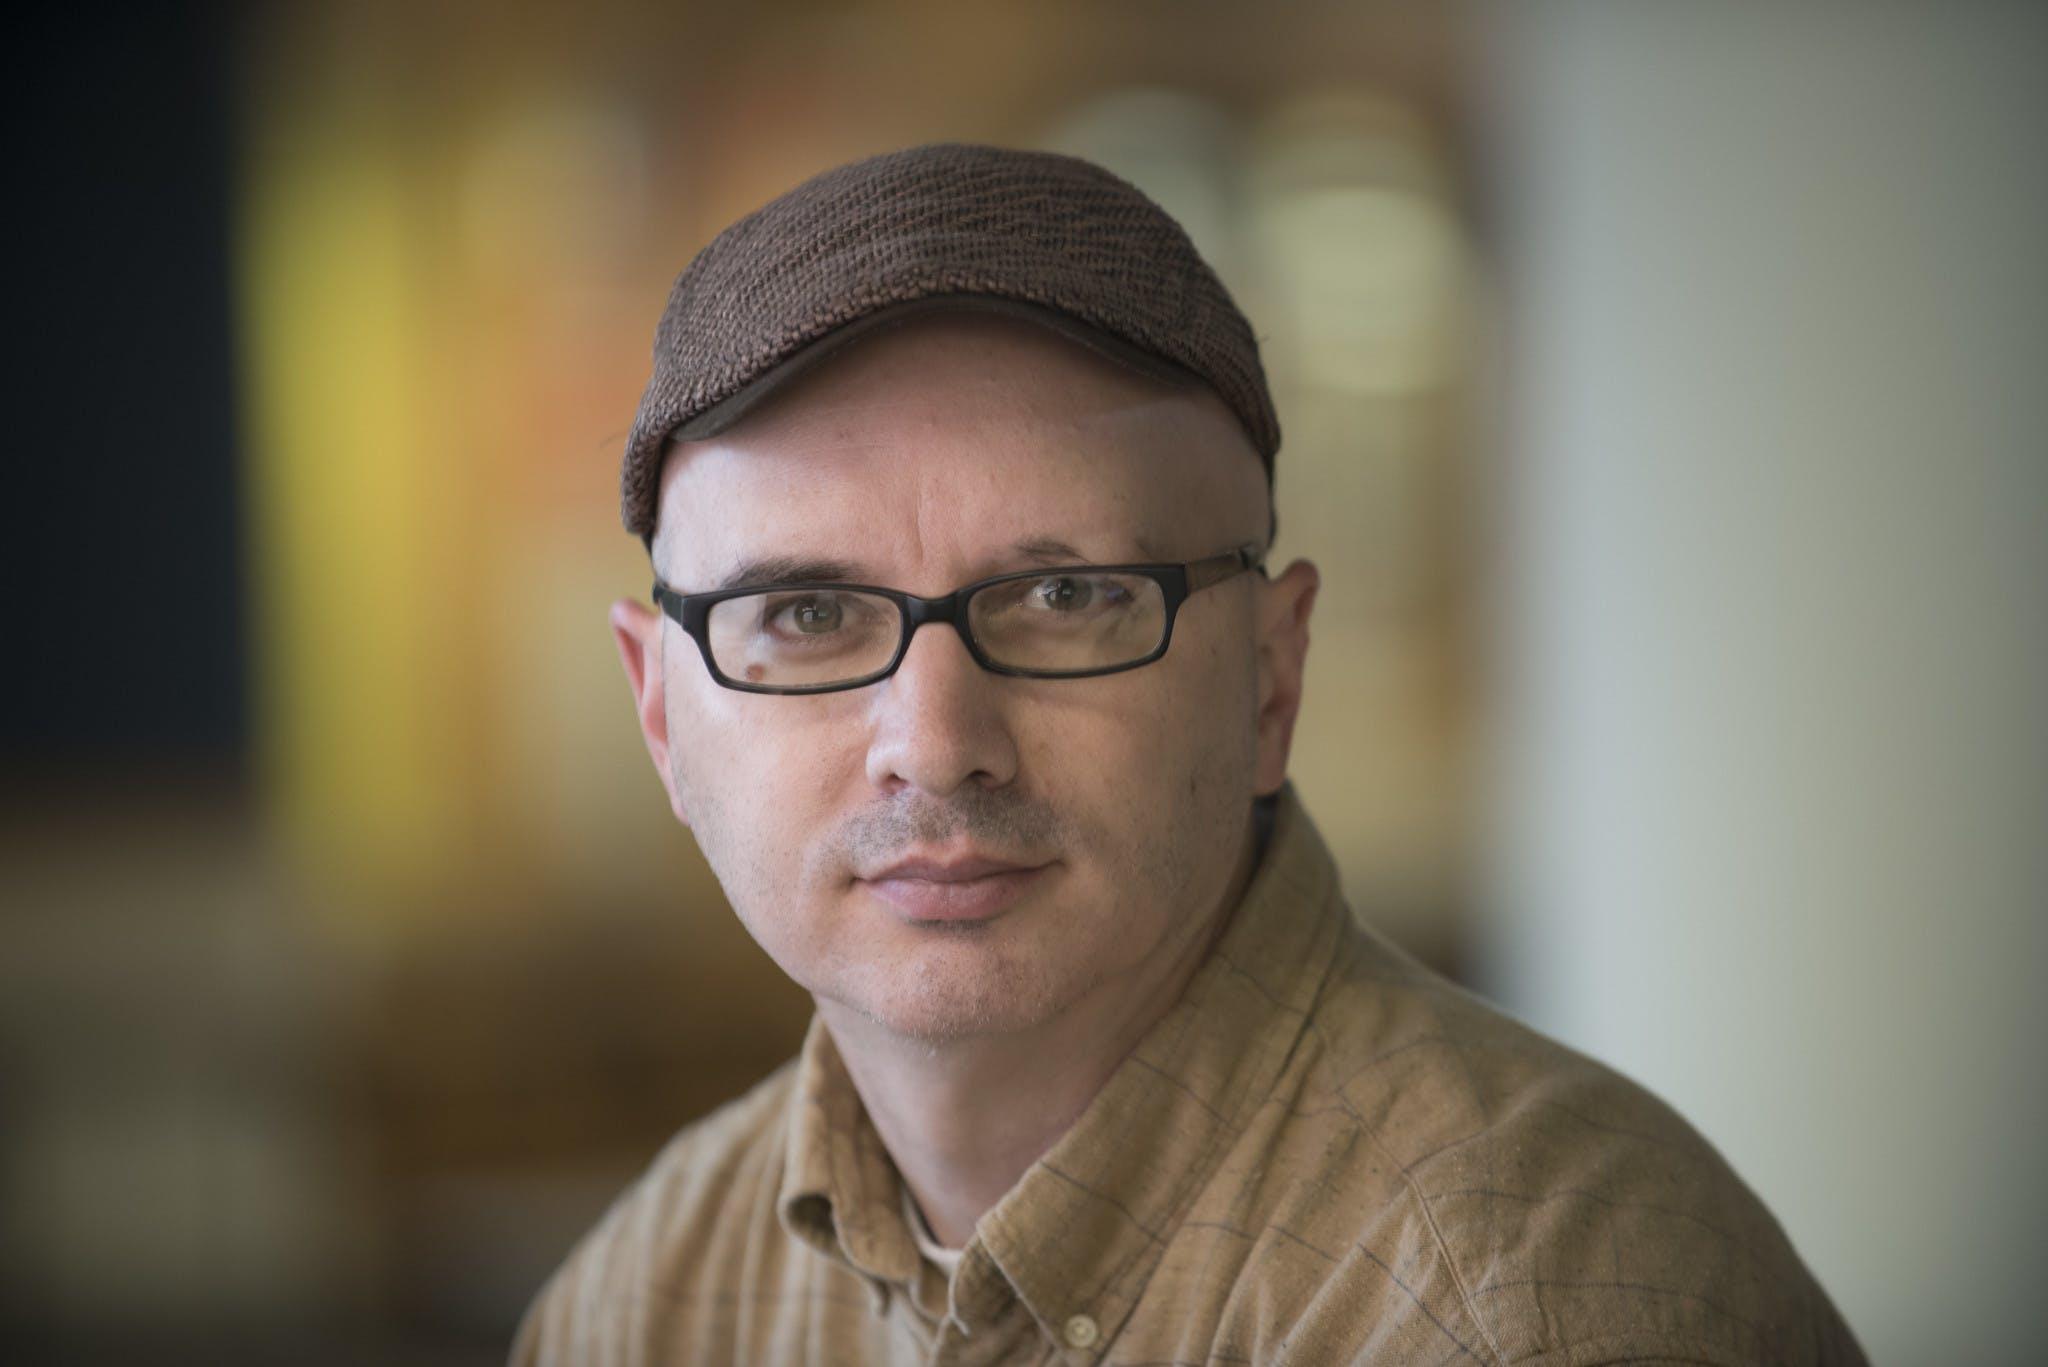 Associate Professor of Journalism Scott Winter wins the National Scholastic Press Association Pioneer Award.